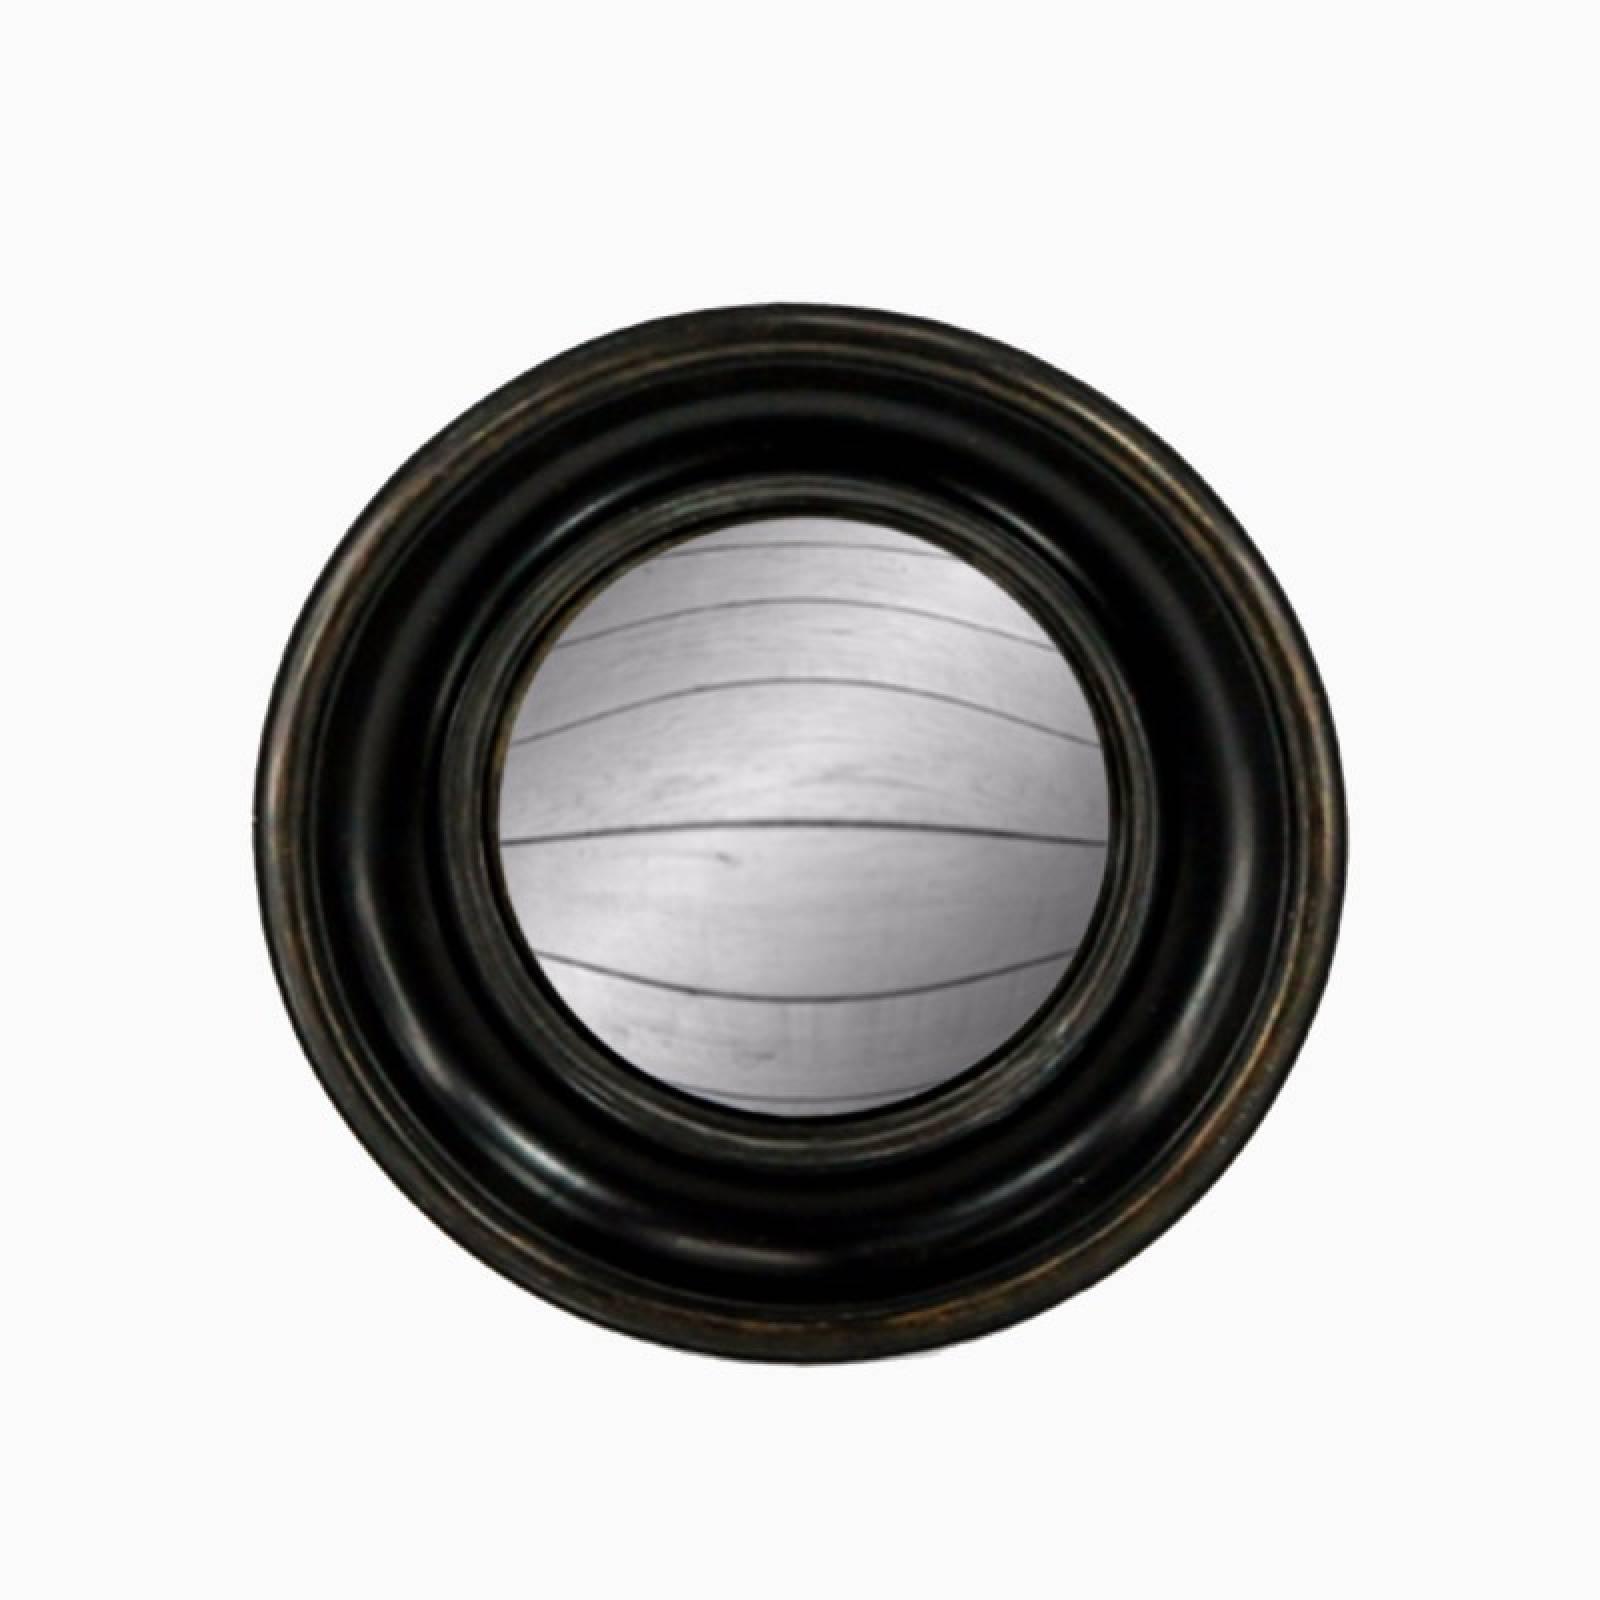 Antiqued Black Deep Framed Medium Convex Mirror D:23cm